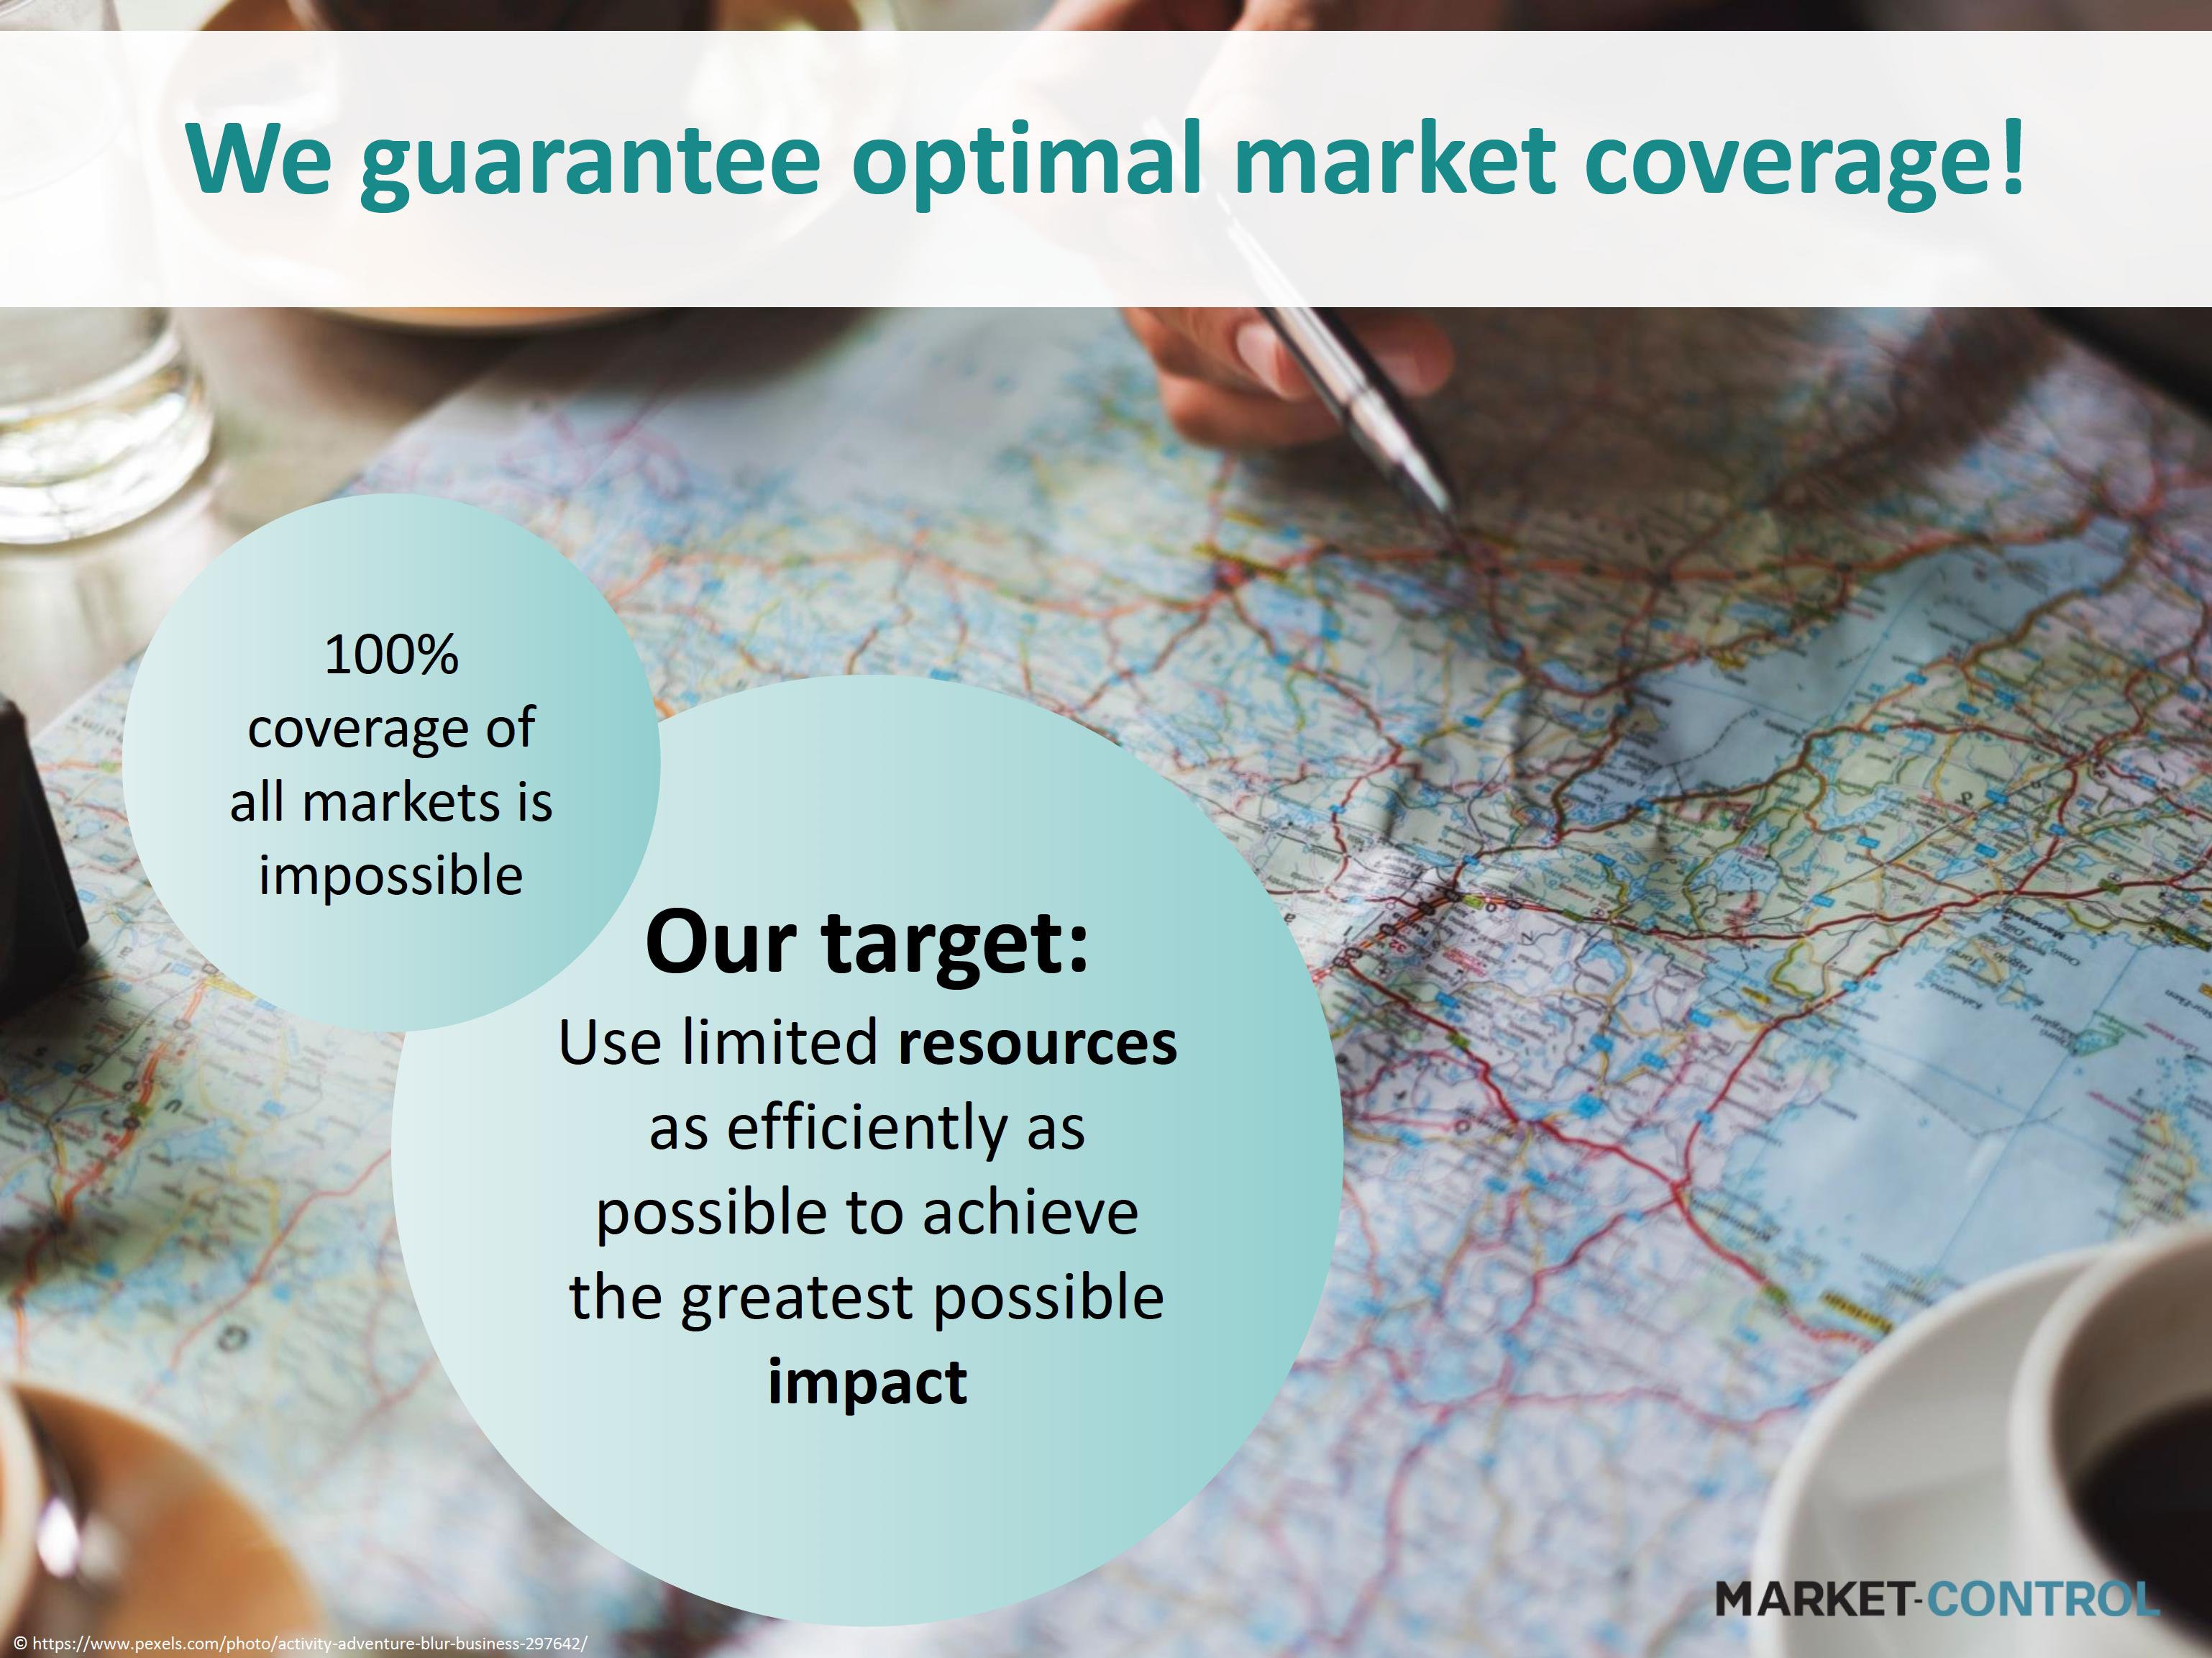 Garantizamos una cobertura óptima del mercado!